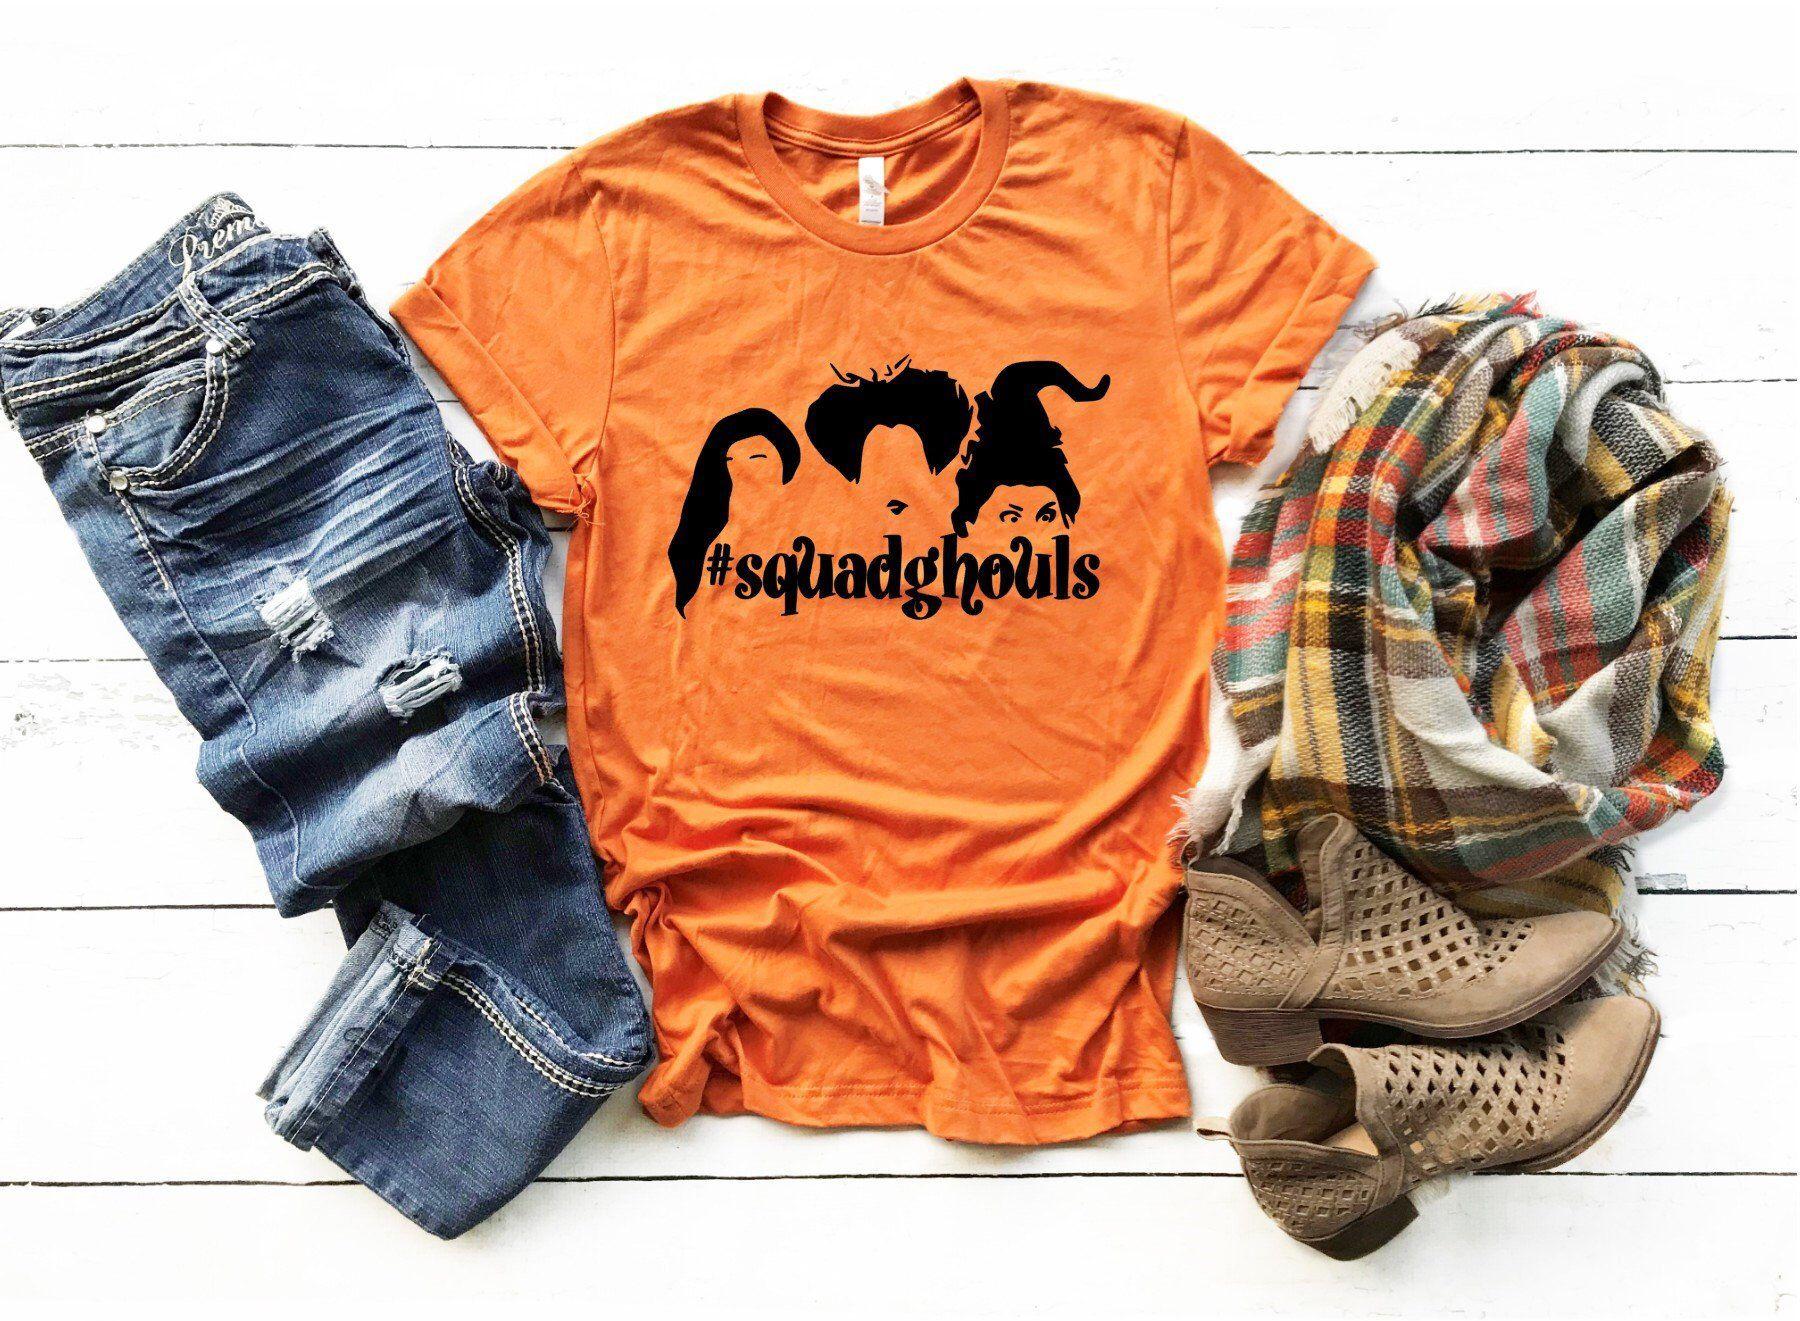 37e794b76 Excited to share this item from my #etsy shop: Halloween Shirt, sanderson  sister shirt, hocus pocus shirt, fall shirt, fall theme, tshirt, burnt  orange ...